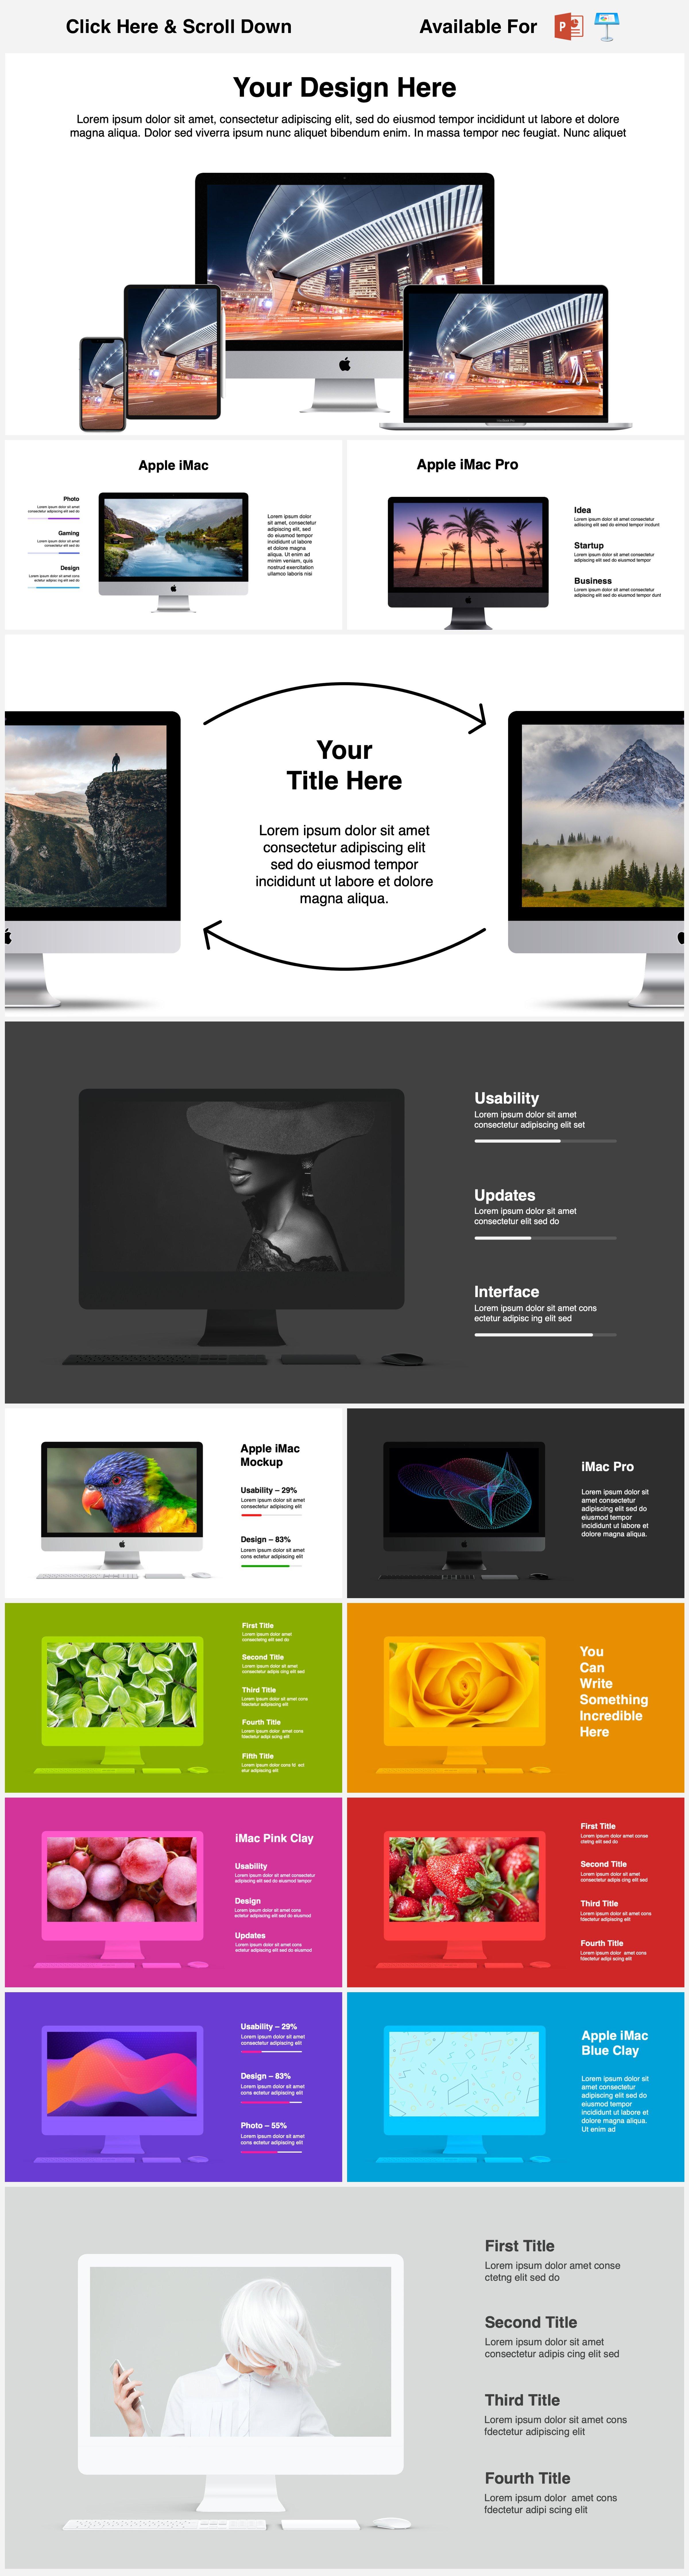 Animated Mockups Presentation Bundle. Infographic Templates. example image 5